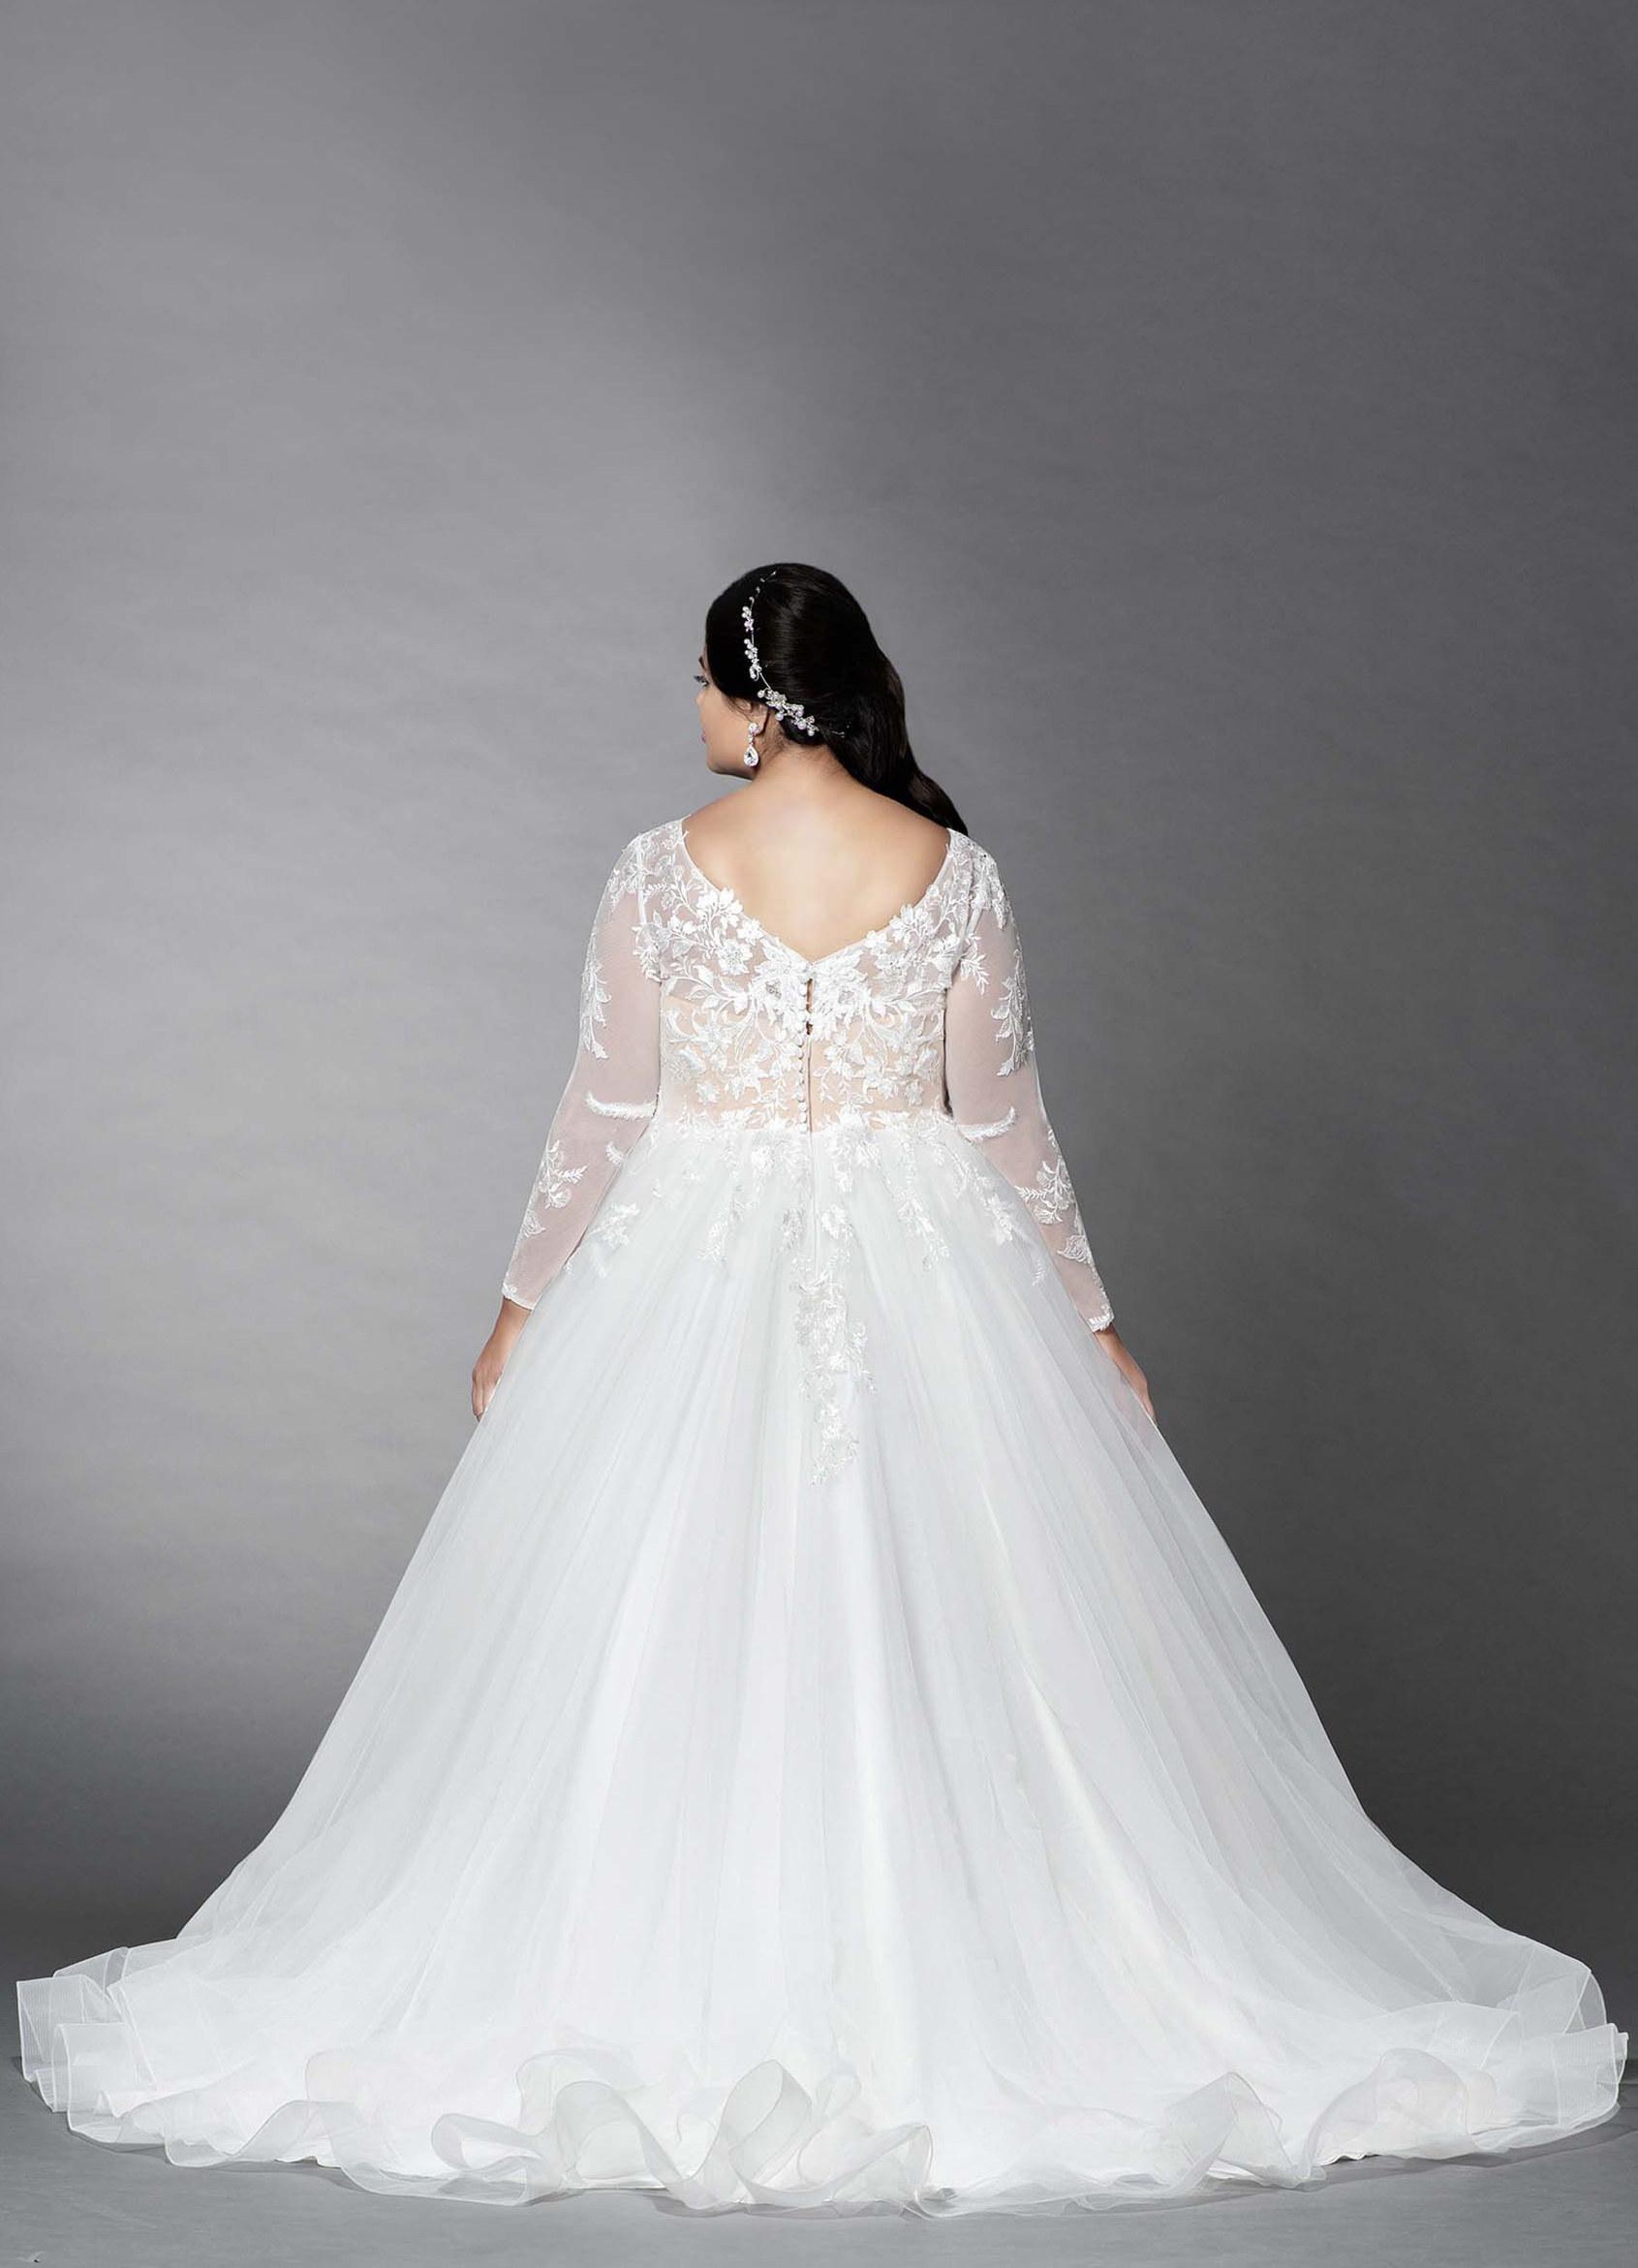 Freya Bg Sample Dress